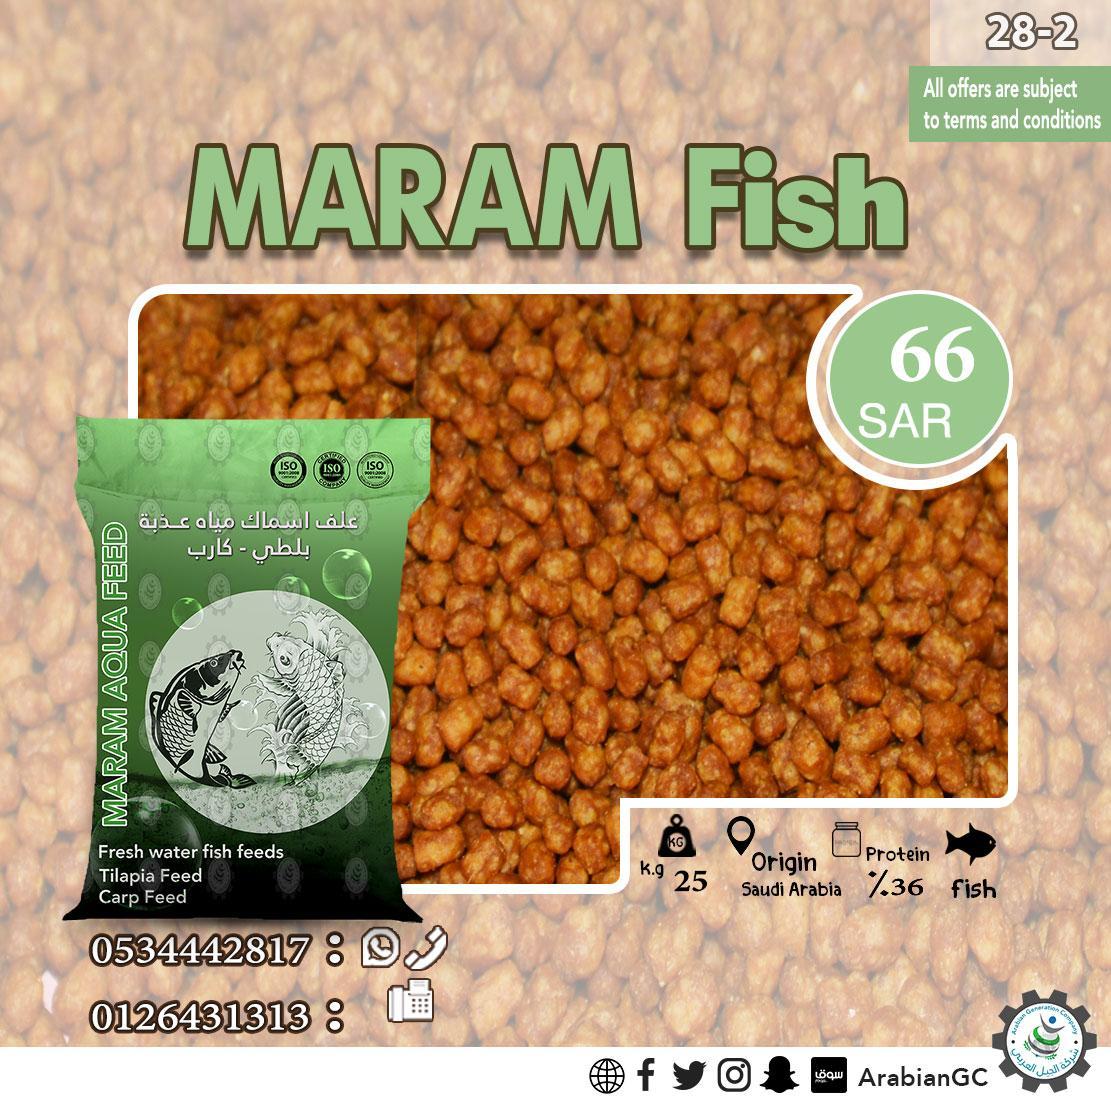 Fish feed d.php?hash=TNSIHSBO2